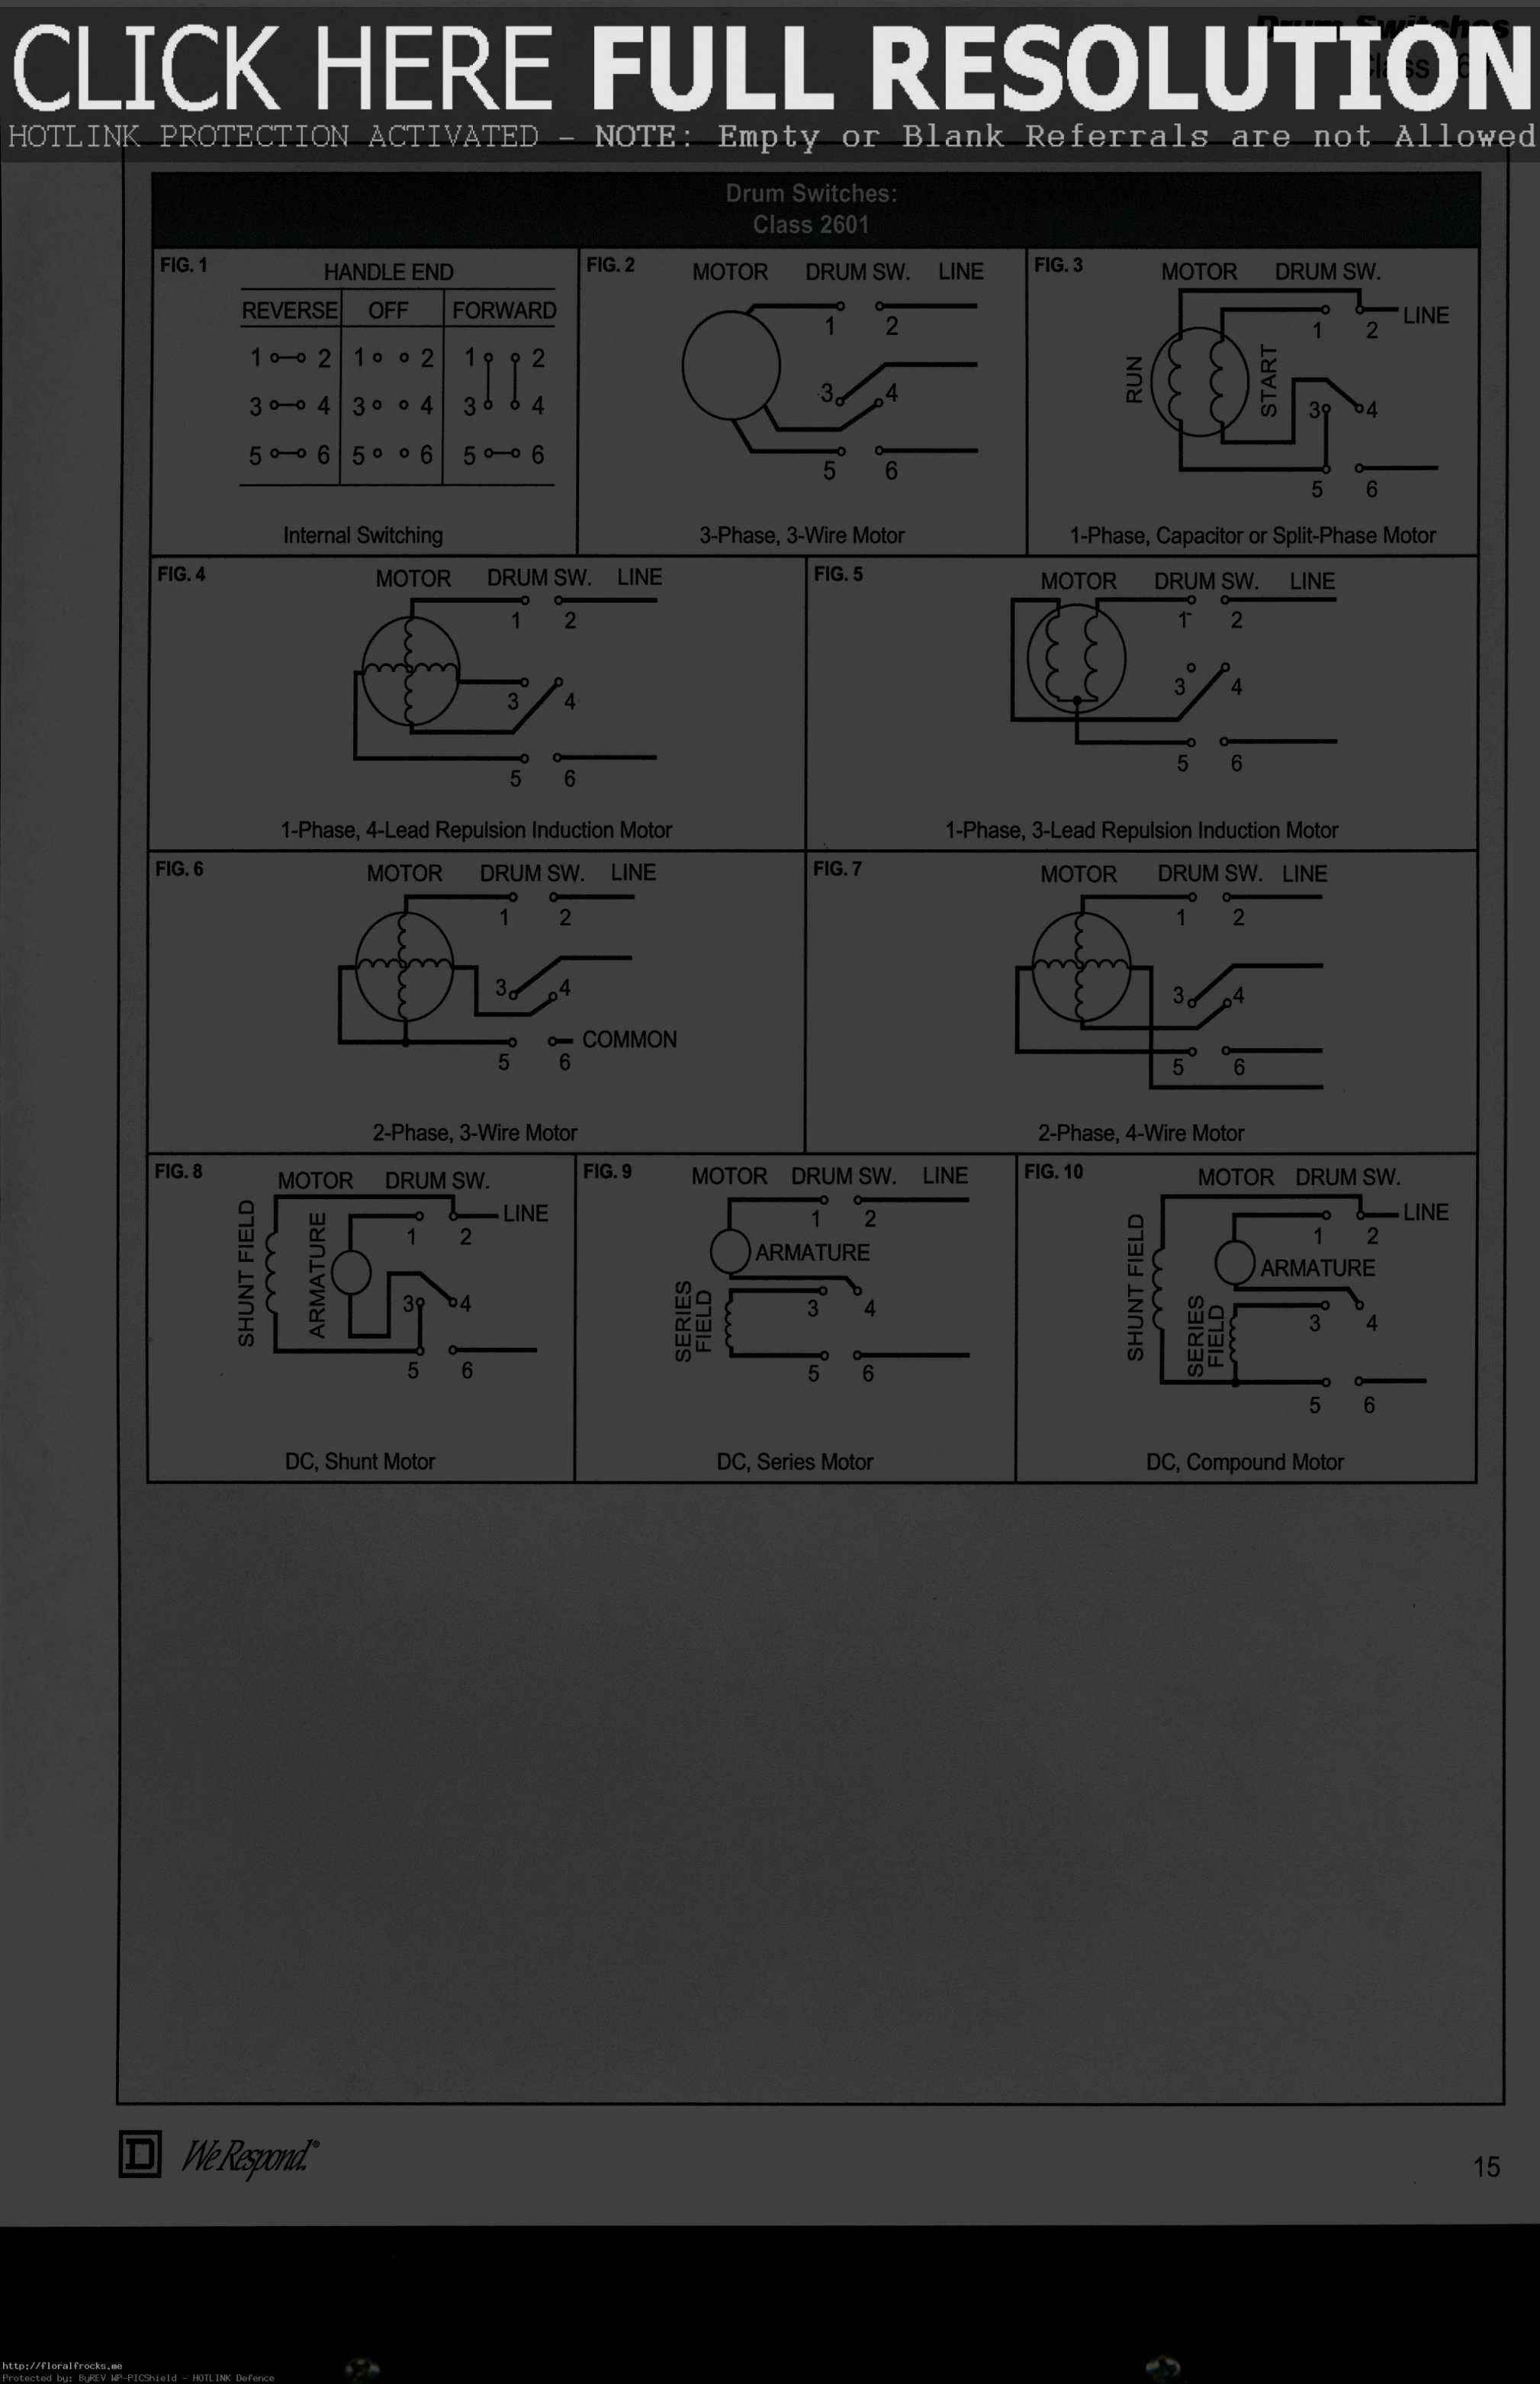 Pentair Pump Wiring Diagram - Wiring Diagrams Hubs - Pentair Pool Pump Wiring Diagram